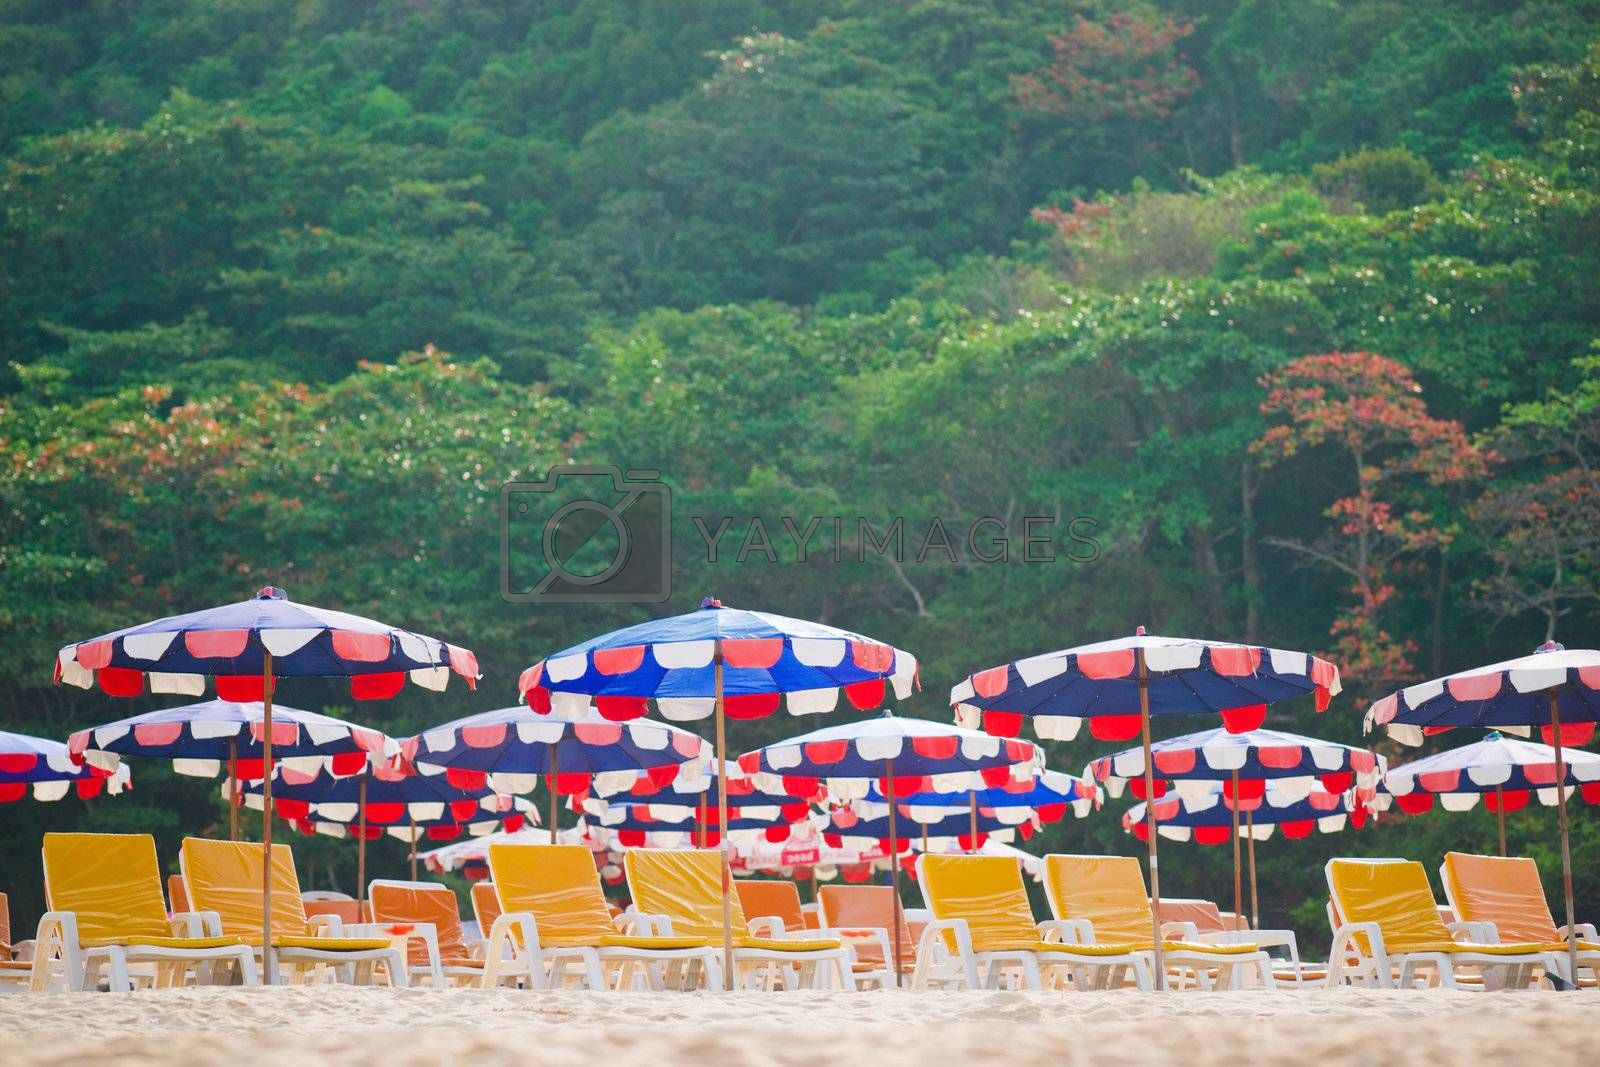 Sun loungers and umbrellas on the sand beach